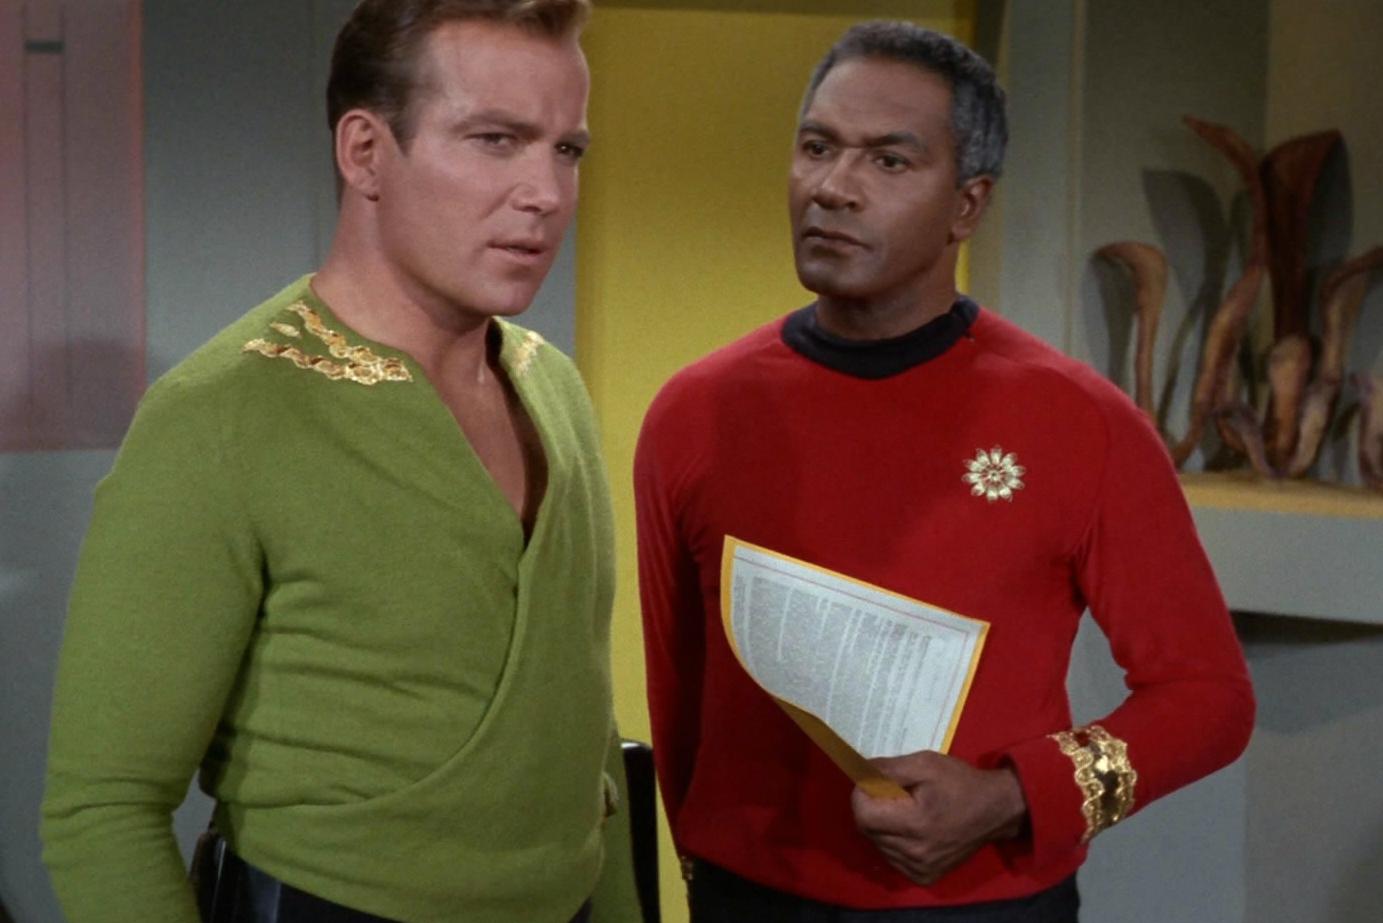 William Shatner wished his Star Trek costumes were looser